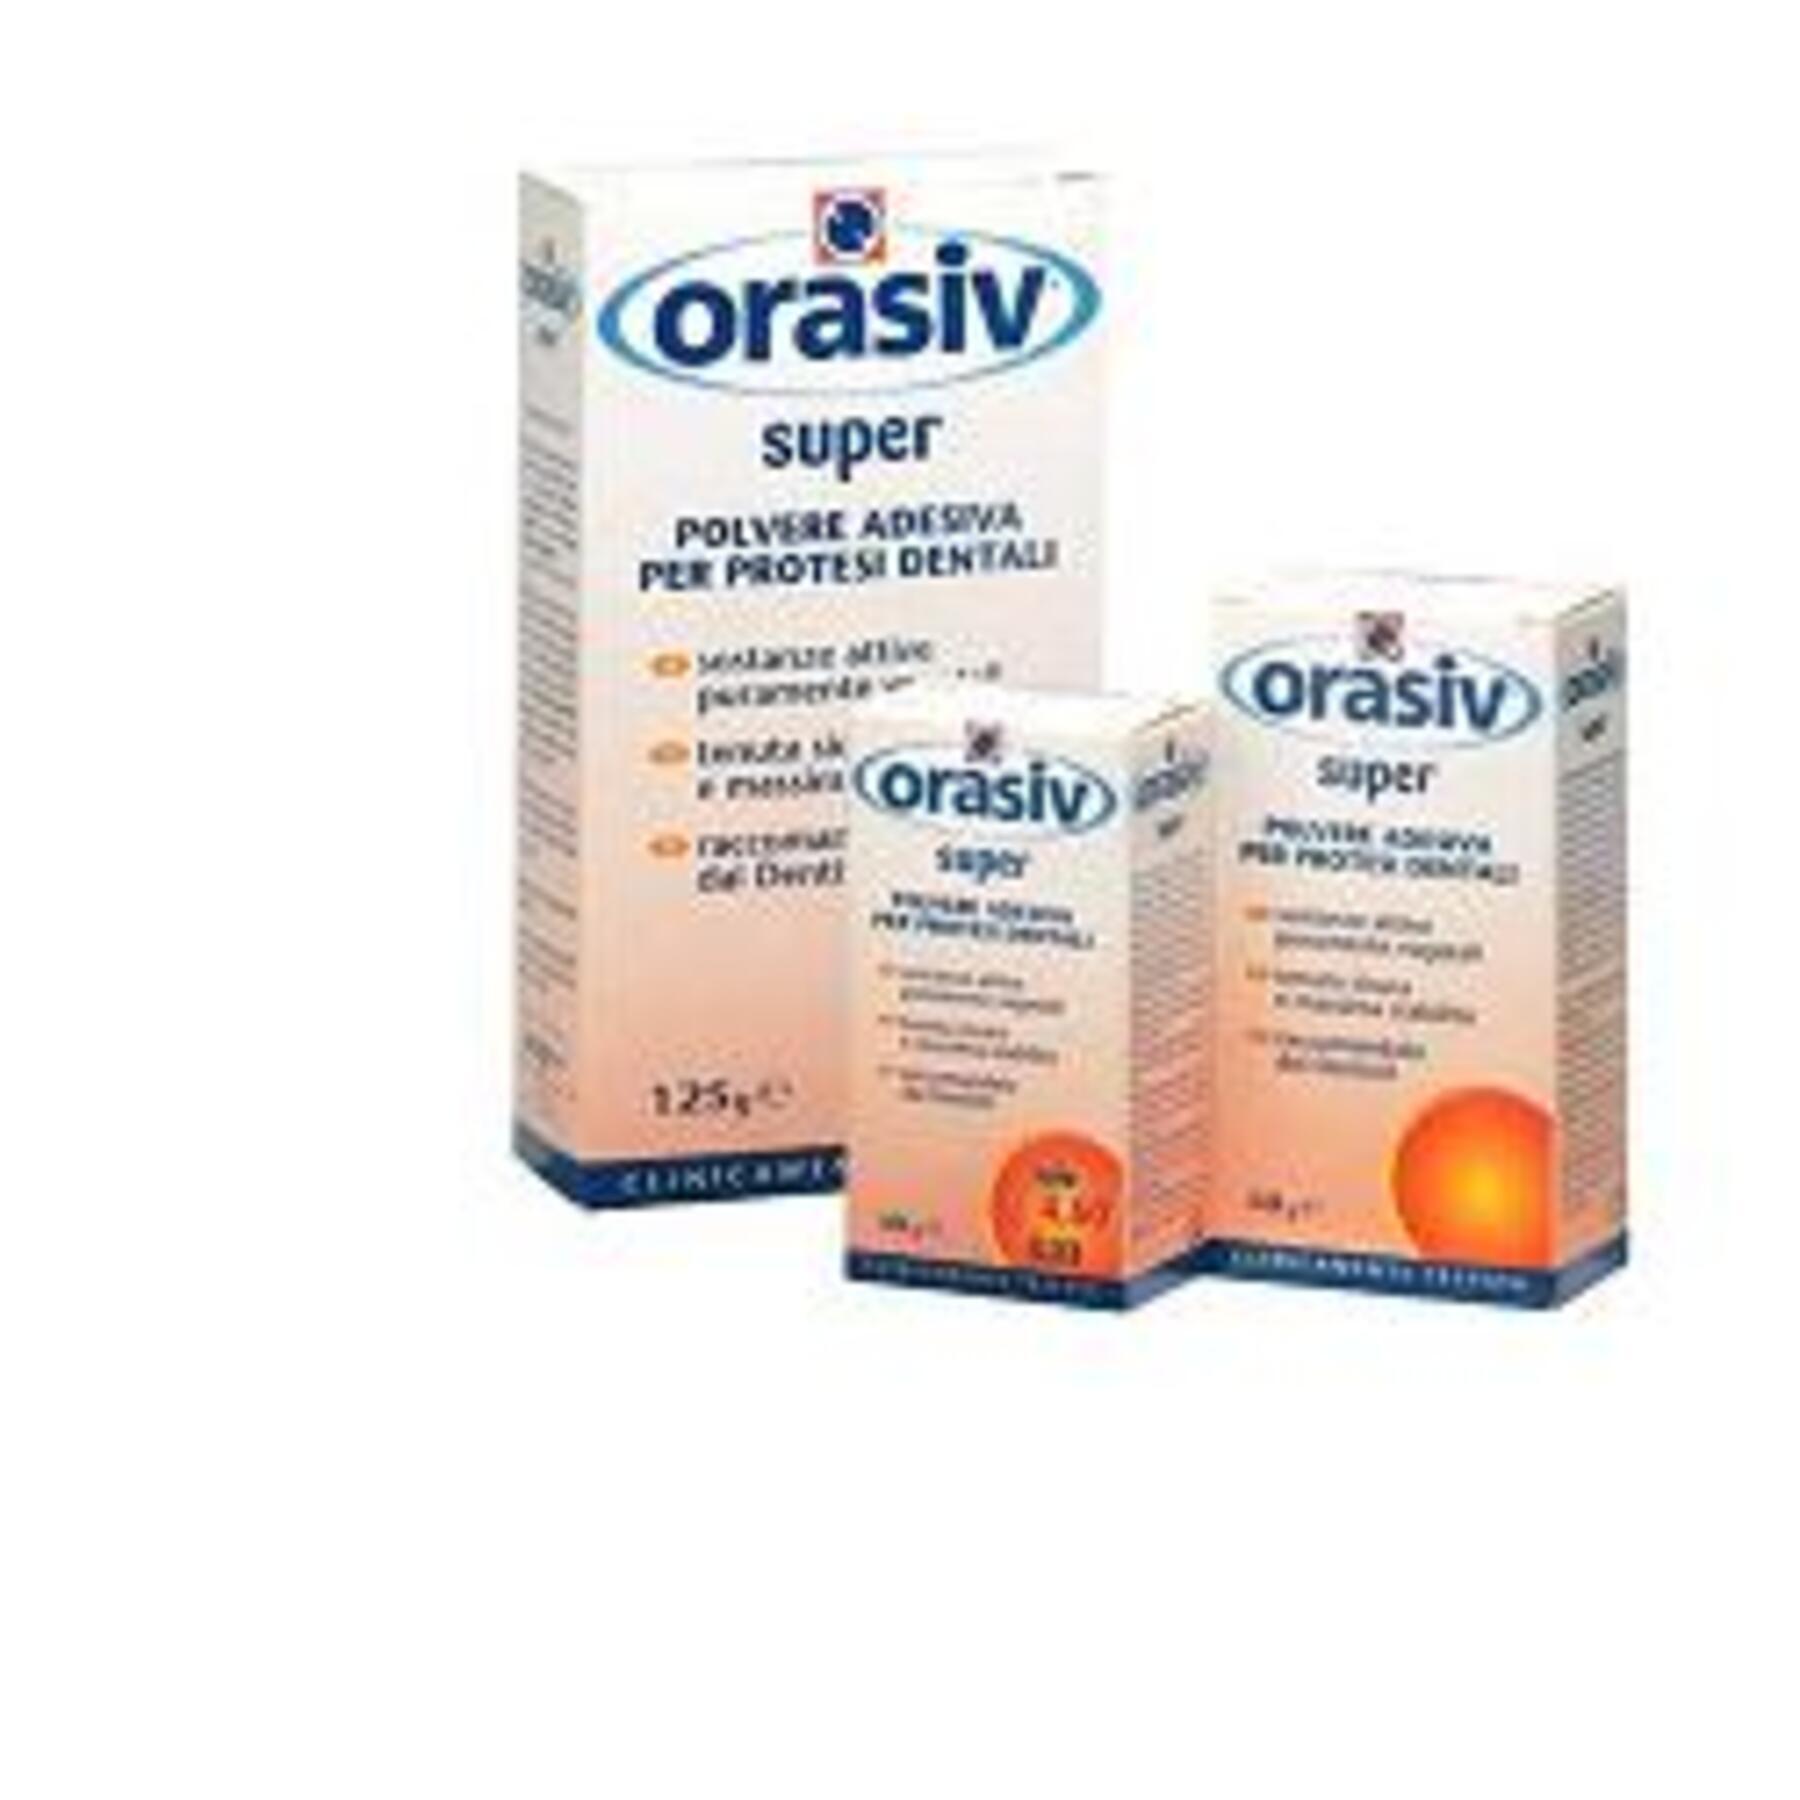 nova argentia srl ind. farm orasiv super polvere adesiva clinica per protesi dentali 125 g